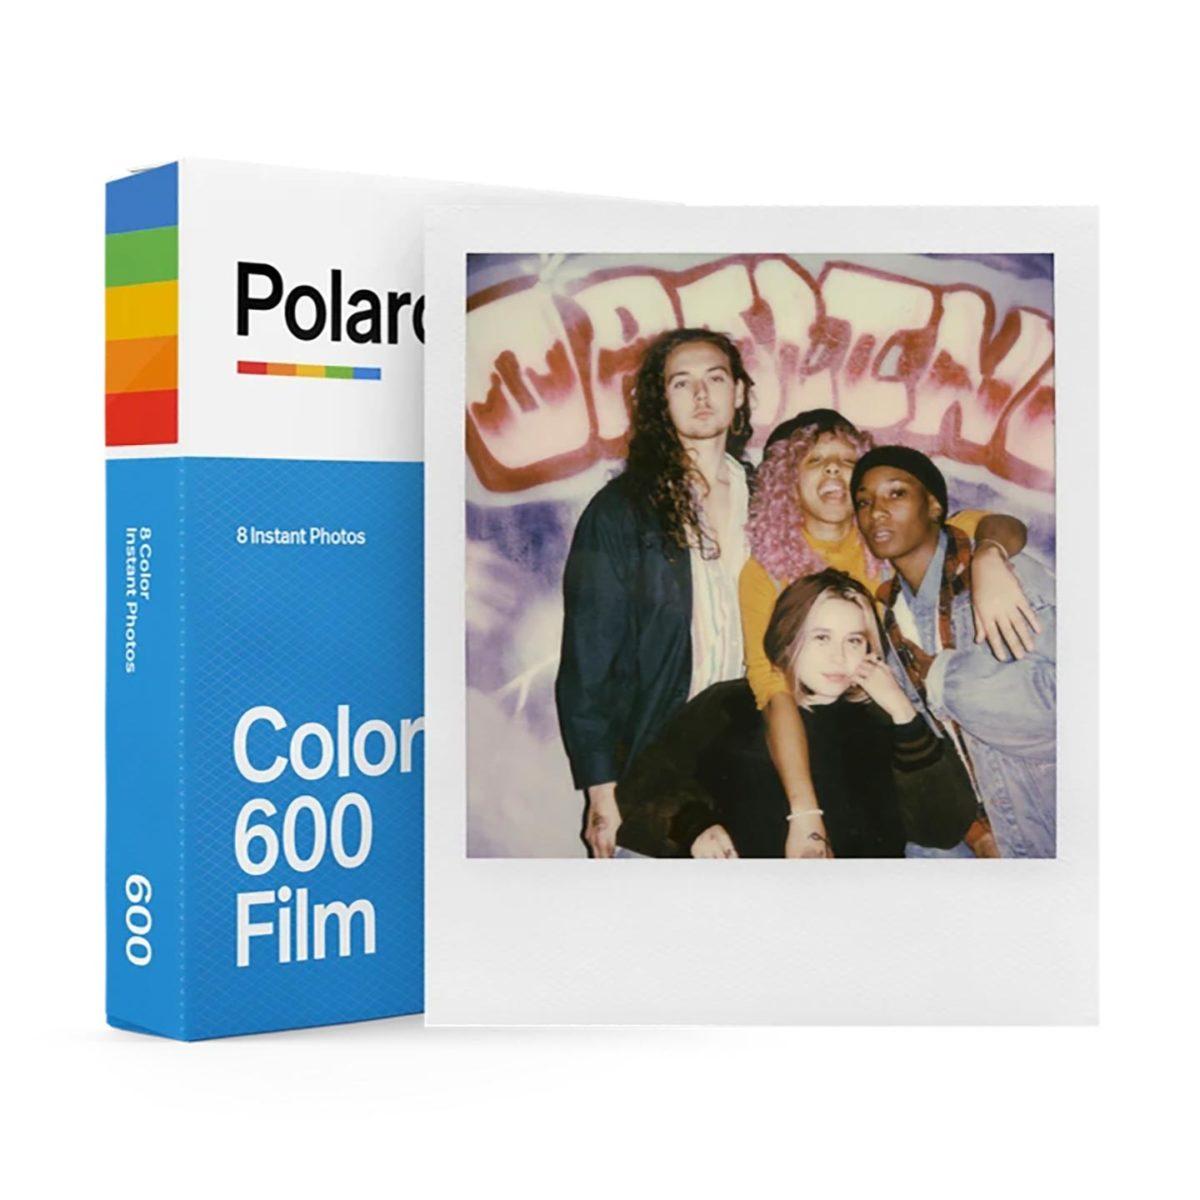 polaroid_600_color_film_01